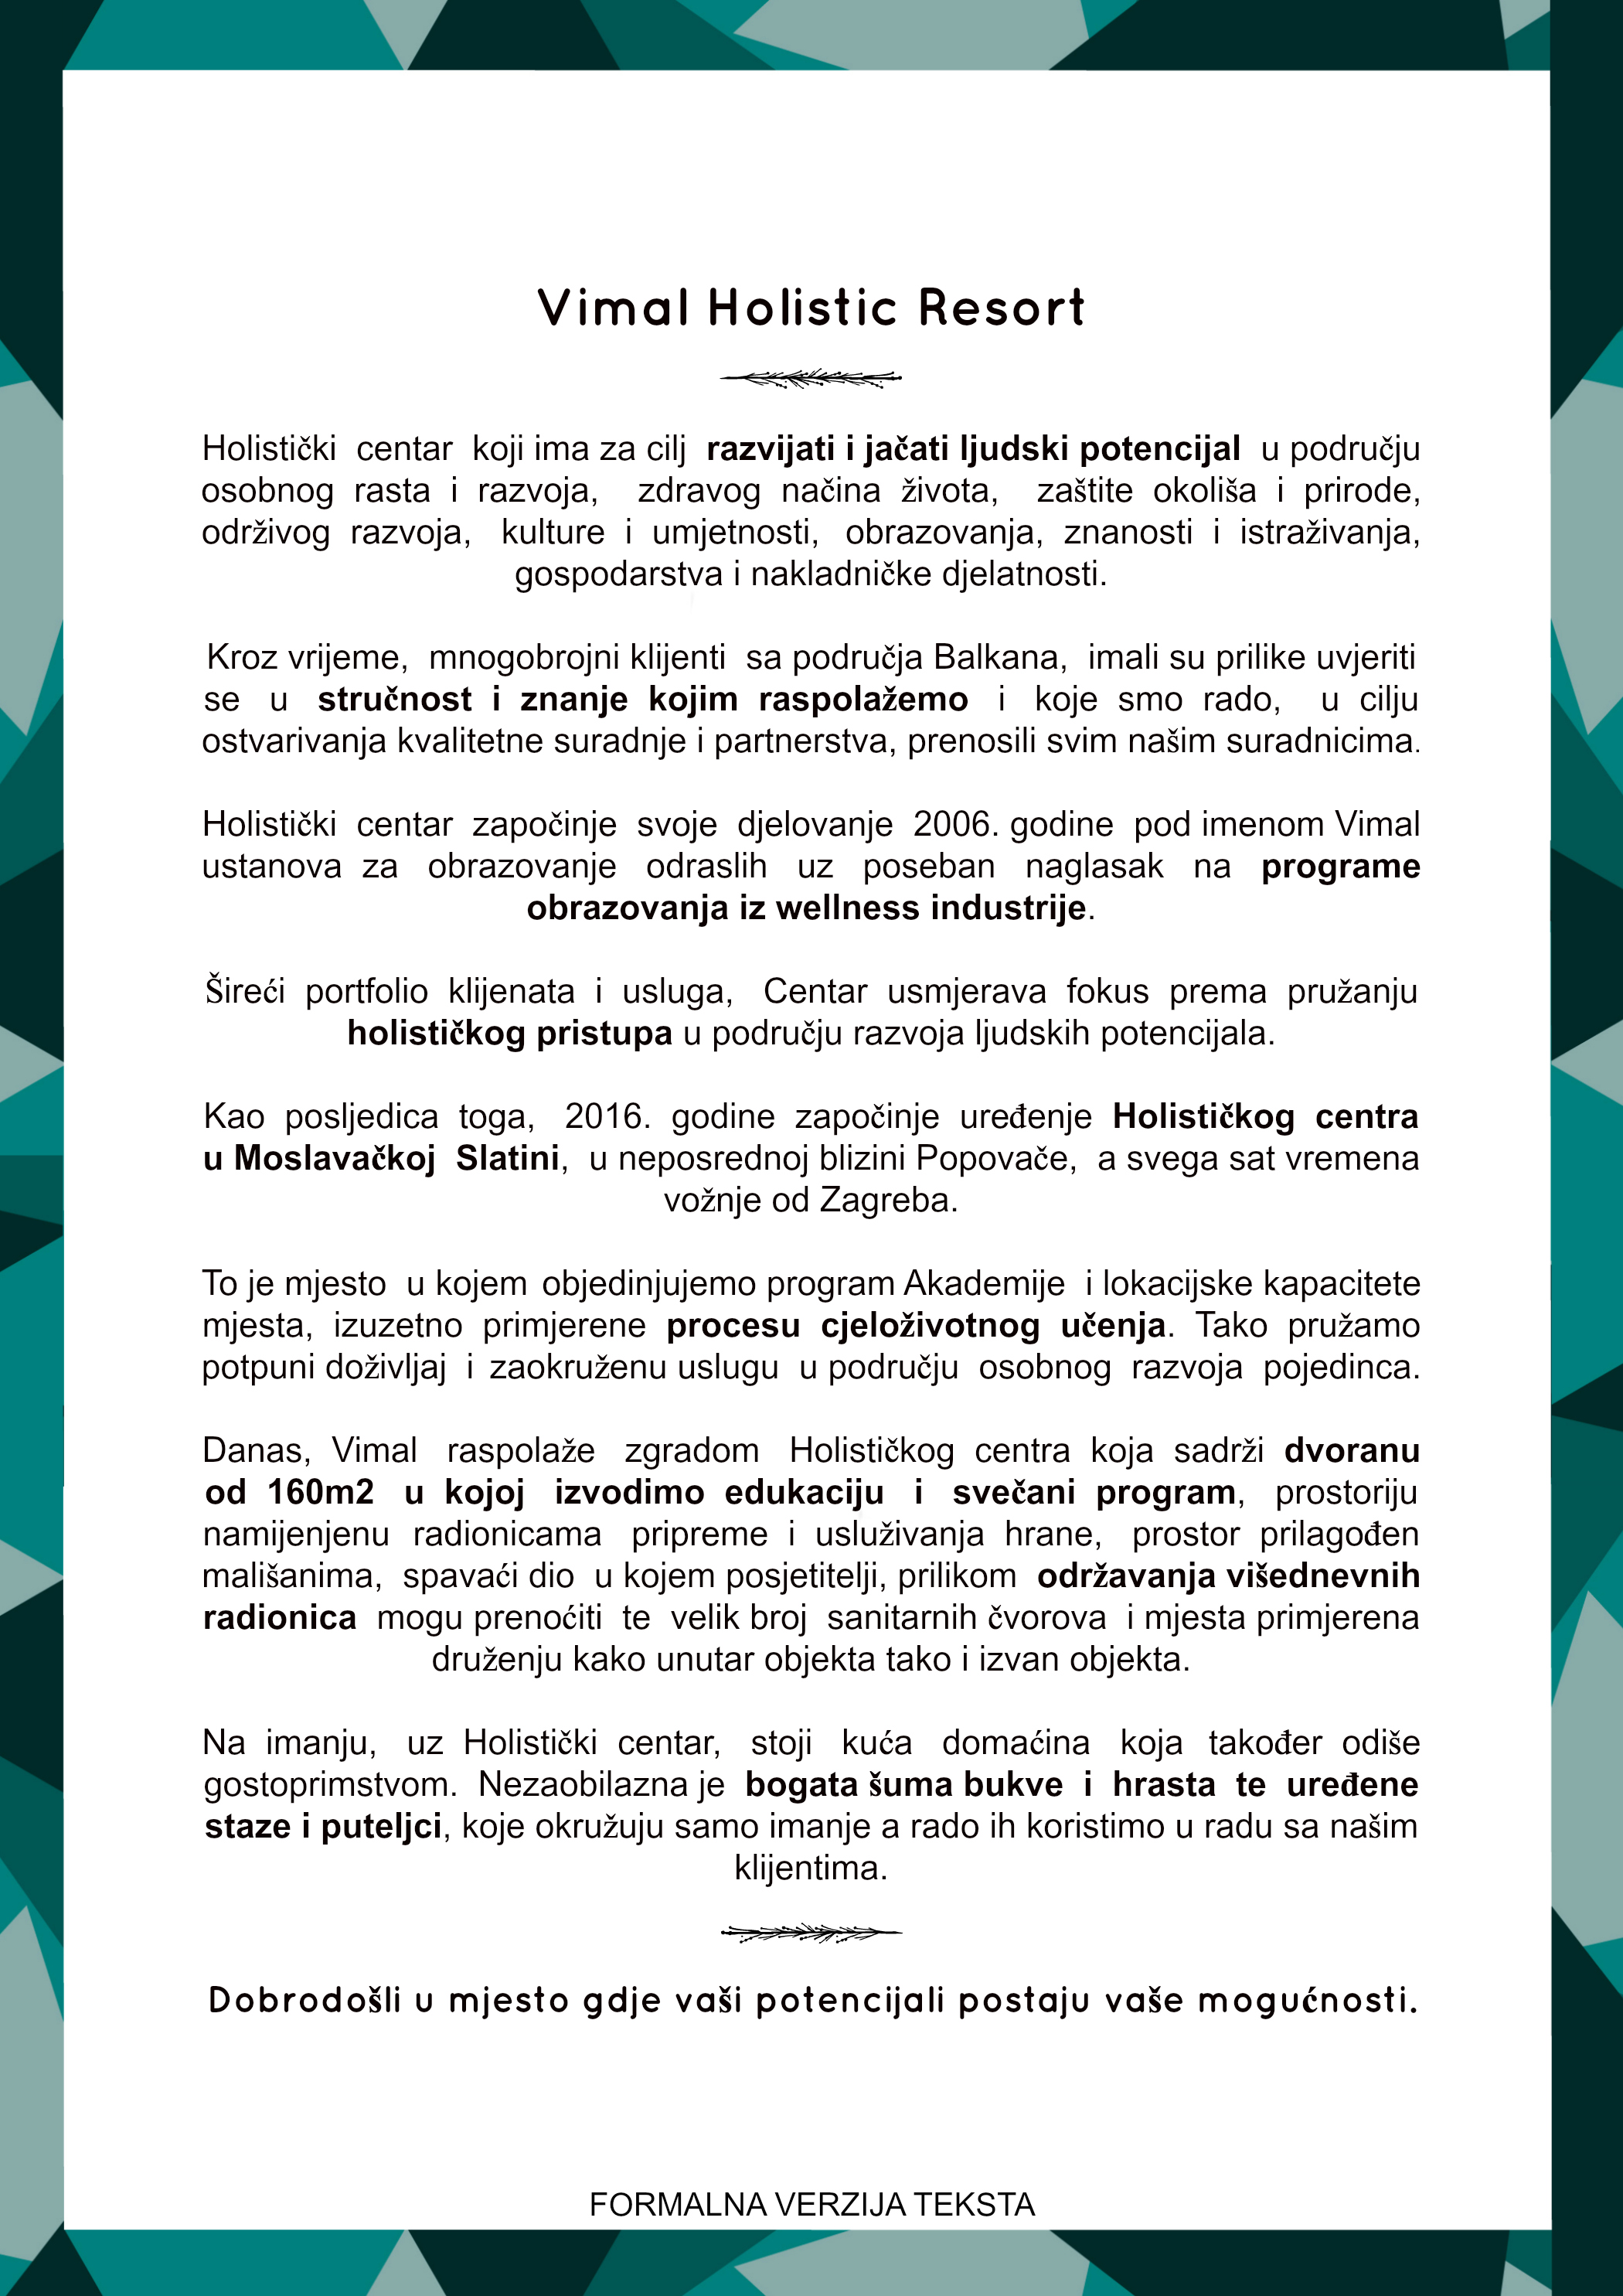 Formalni tekst o predstavljanju